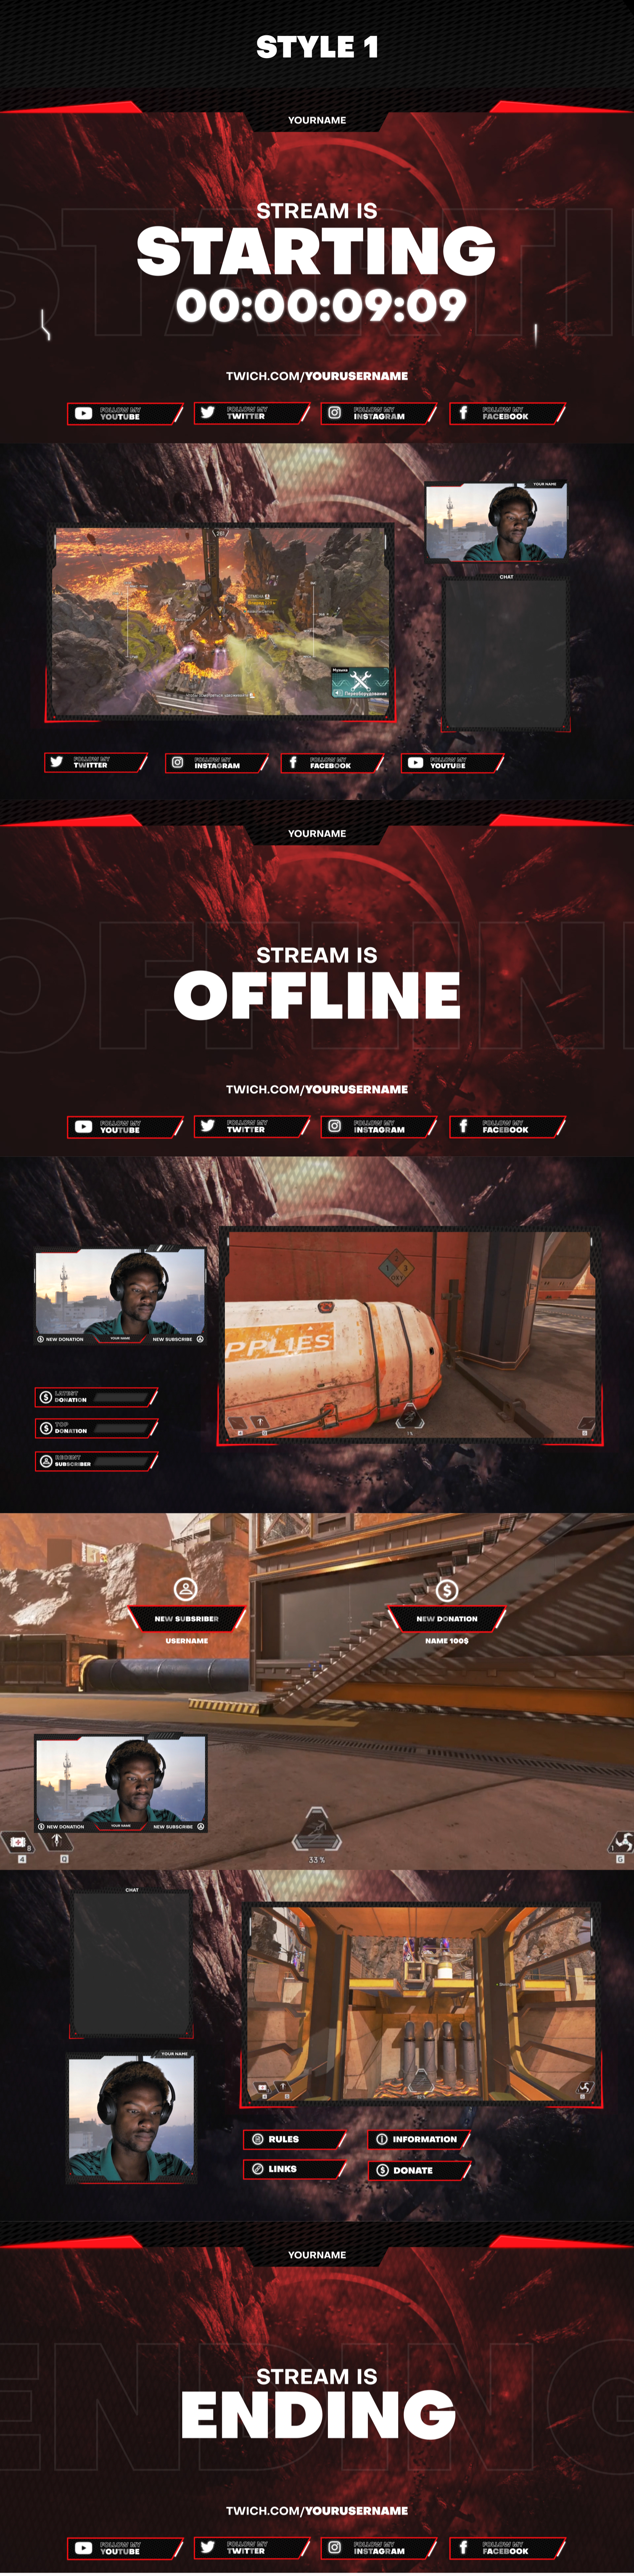 Stream Gaming Pack - 1